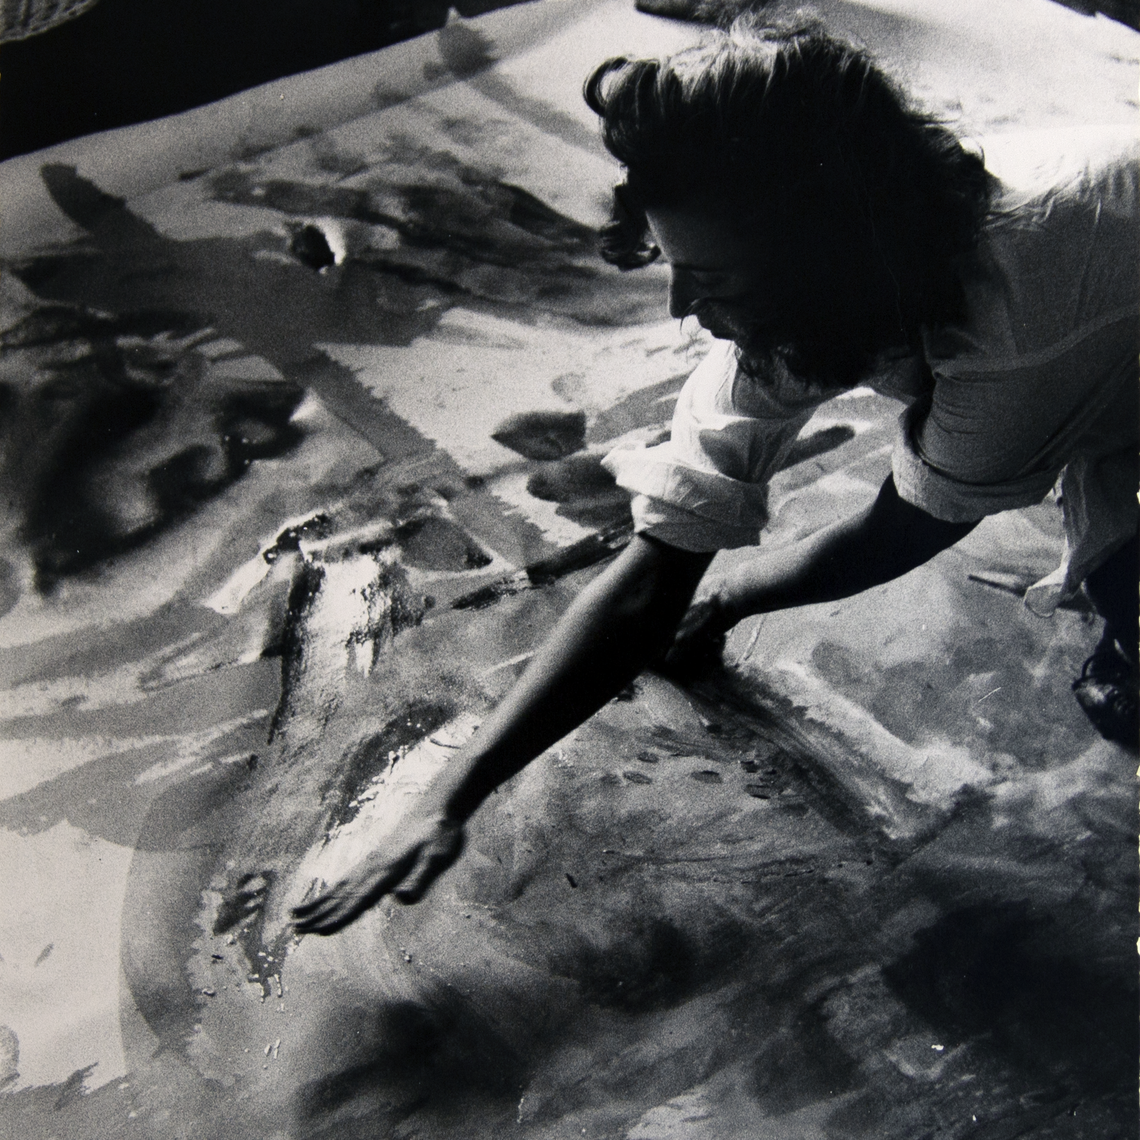 Painter Helen Frankenthaler works on an abstract expressionist painting in her studio, New York City, 1957. Burt Glinn (American, 1925–2008)